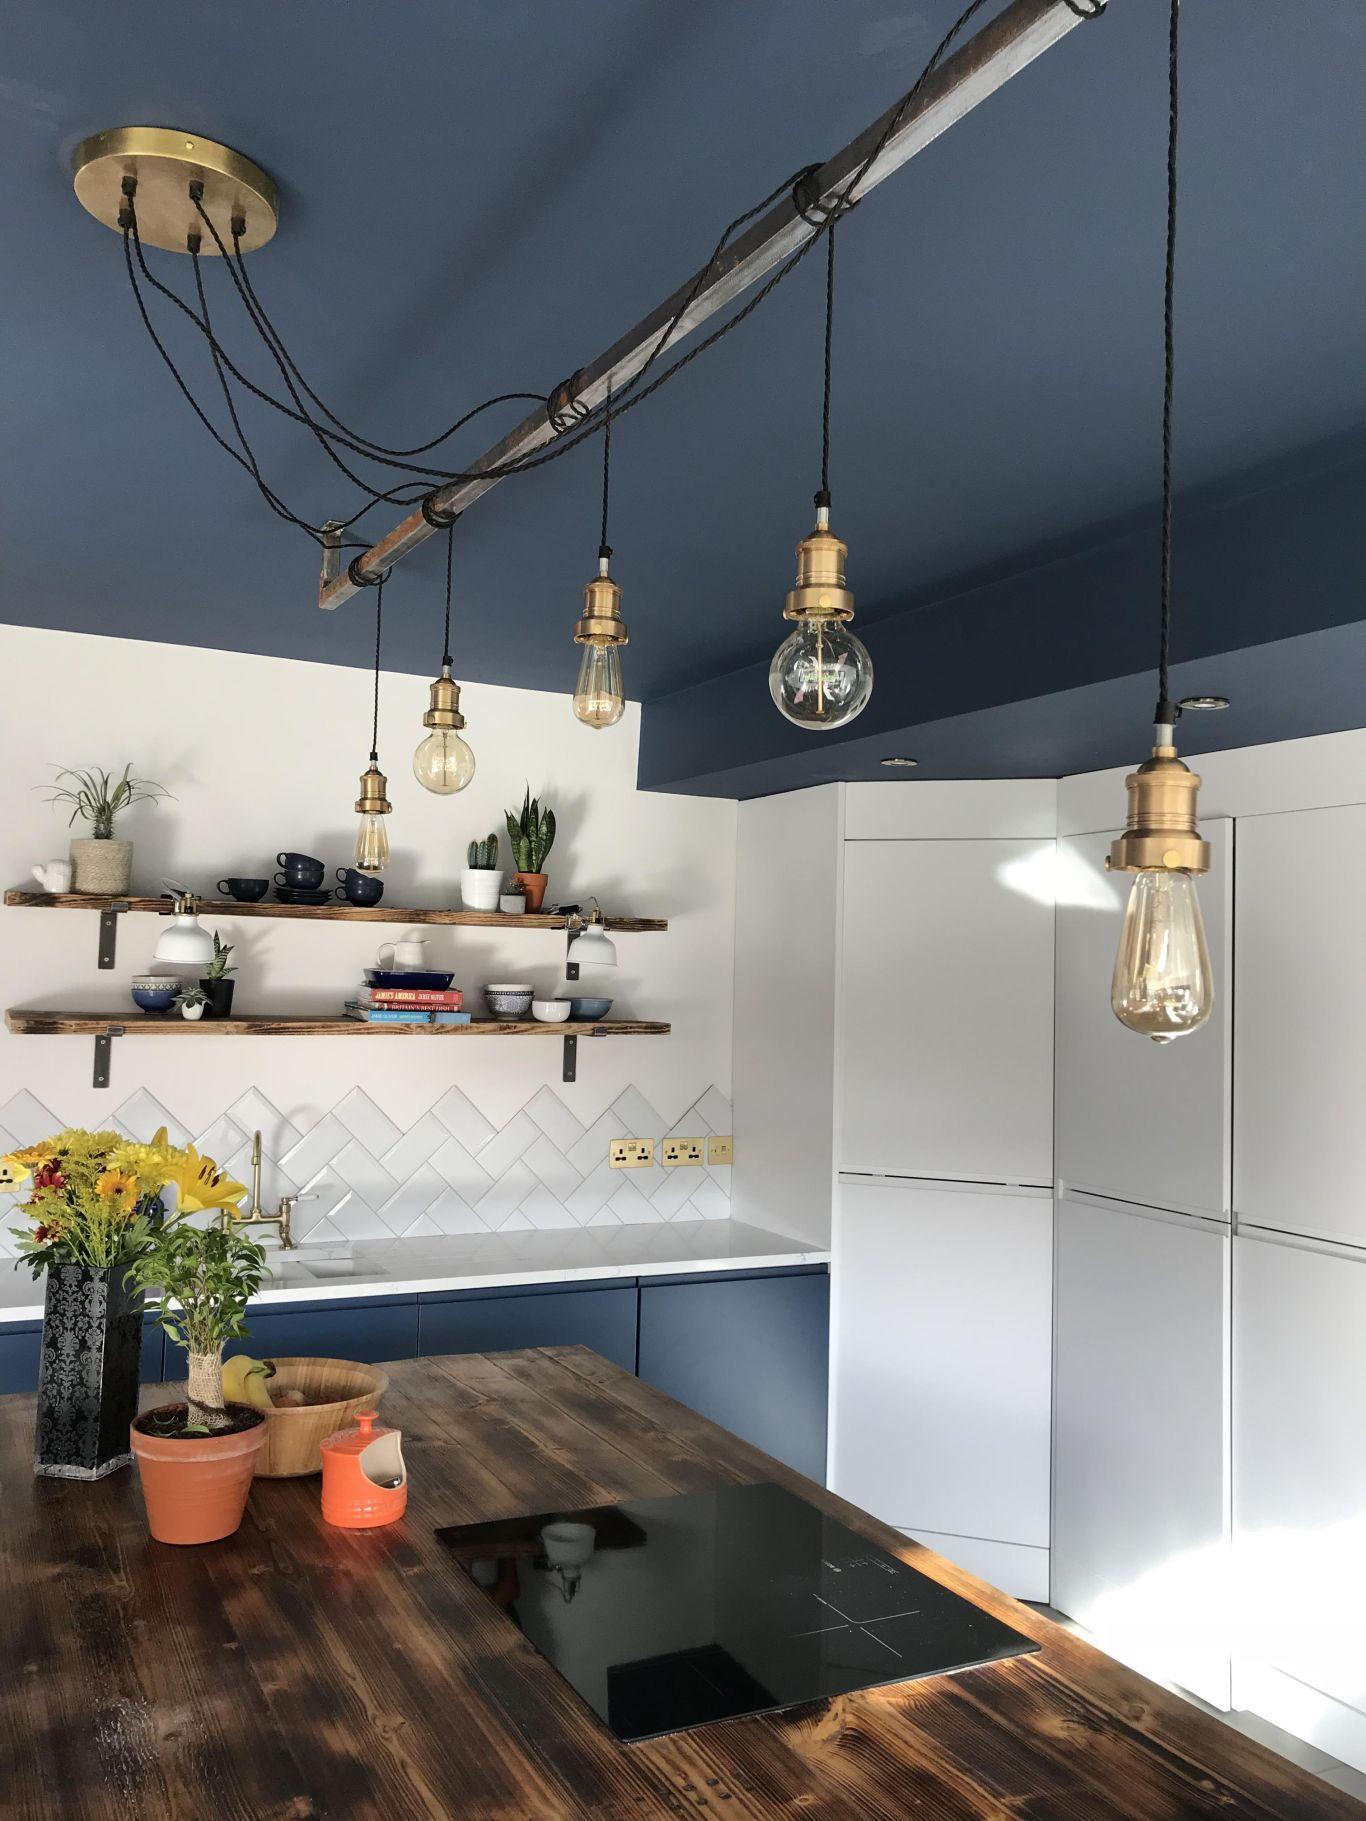 9 kitchen lighting ideas – how to plan your kitchen lighting ...